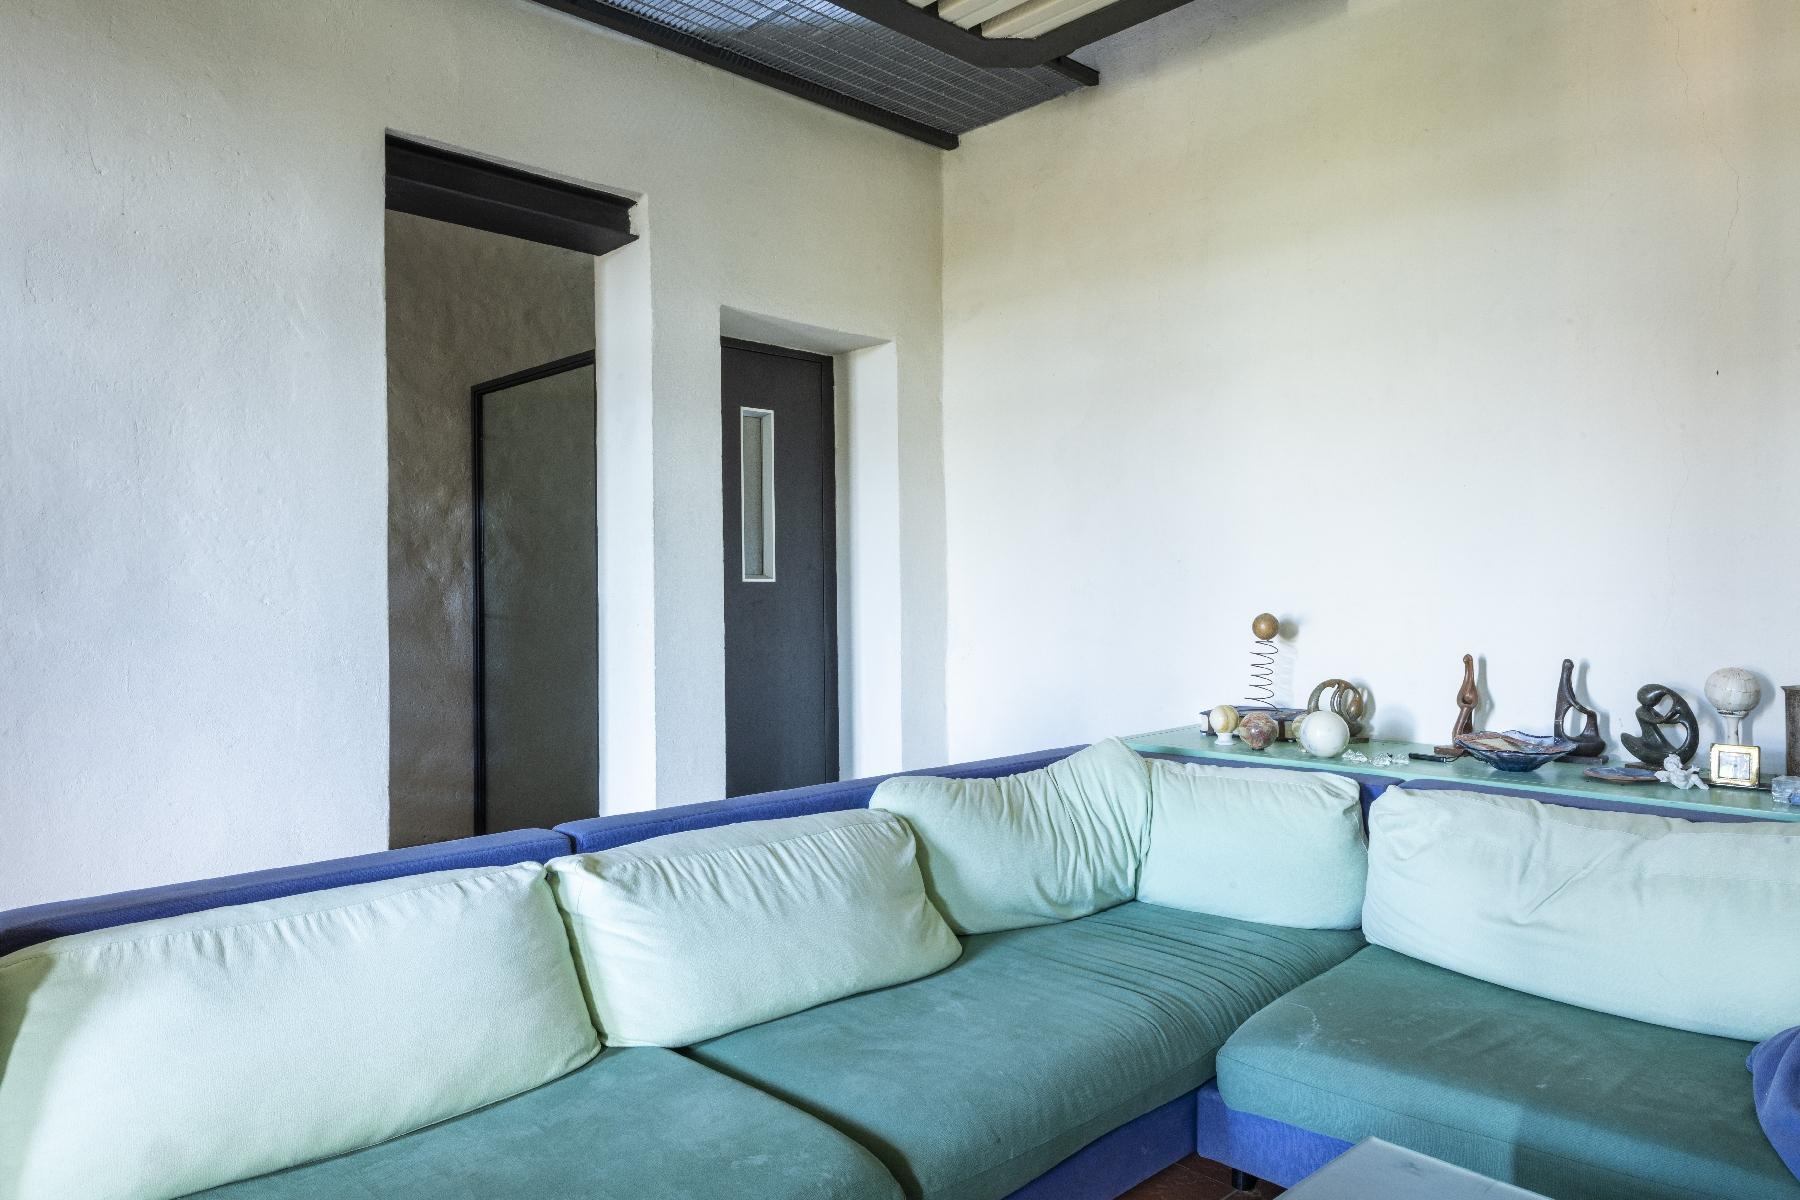 Villa in Vendita a Camaiore: 5 locali, 2800 mq - Foto 17